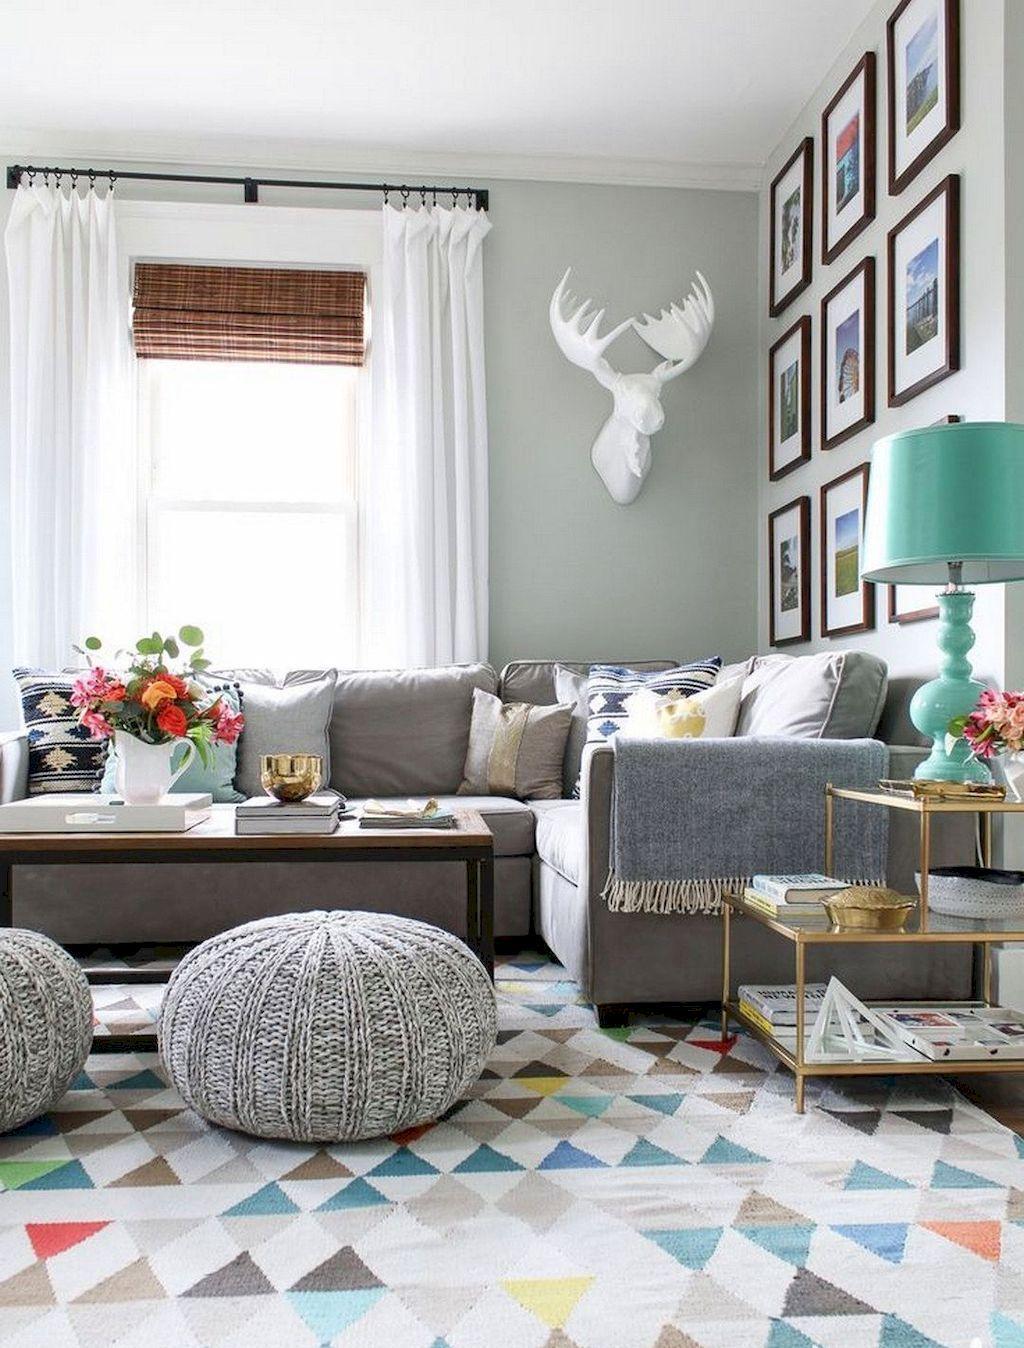 Creative Living Room Ideas 12 Family Friendly Living Room Colourful Living Room Kid Friendly Living Room